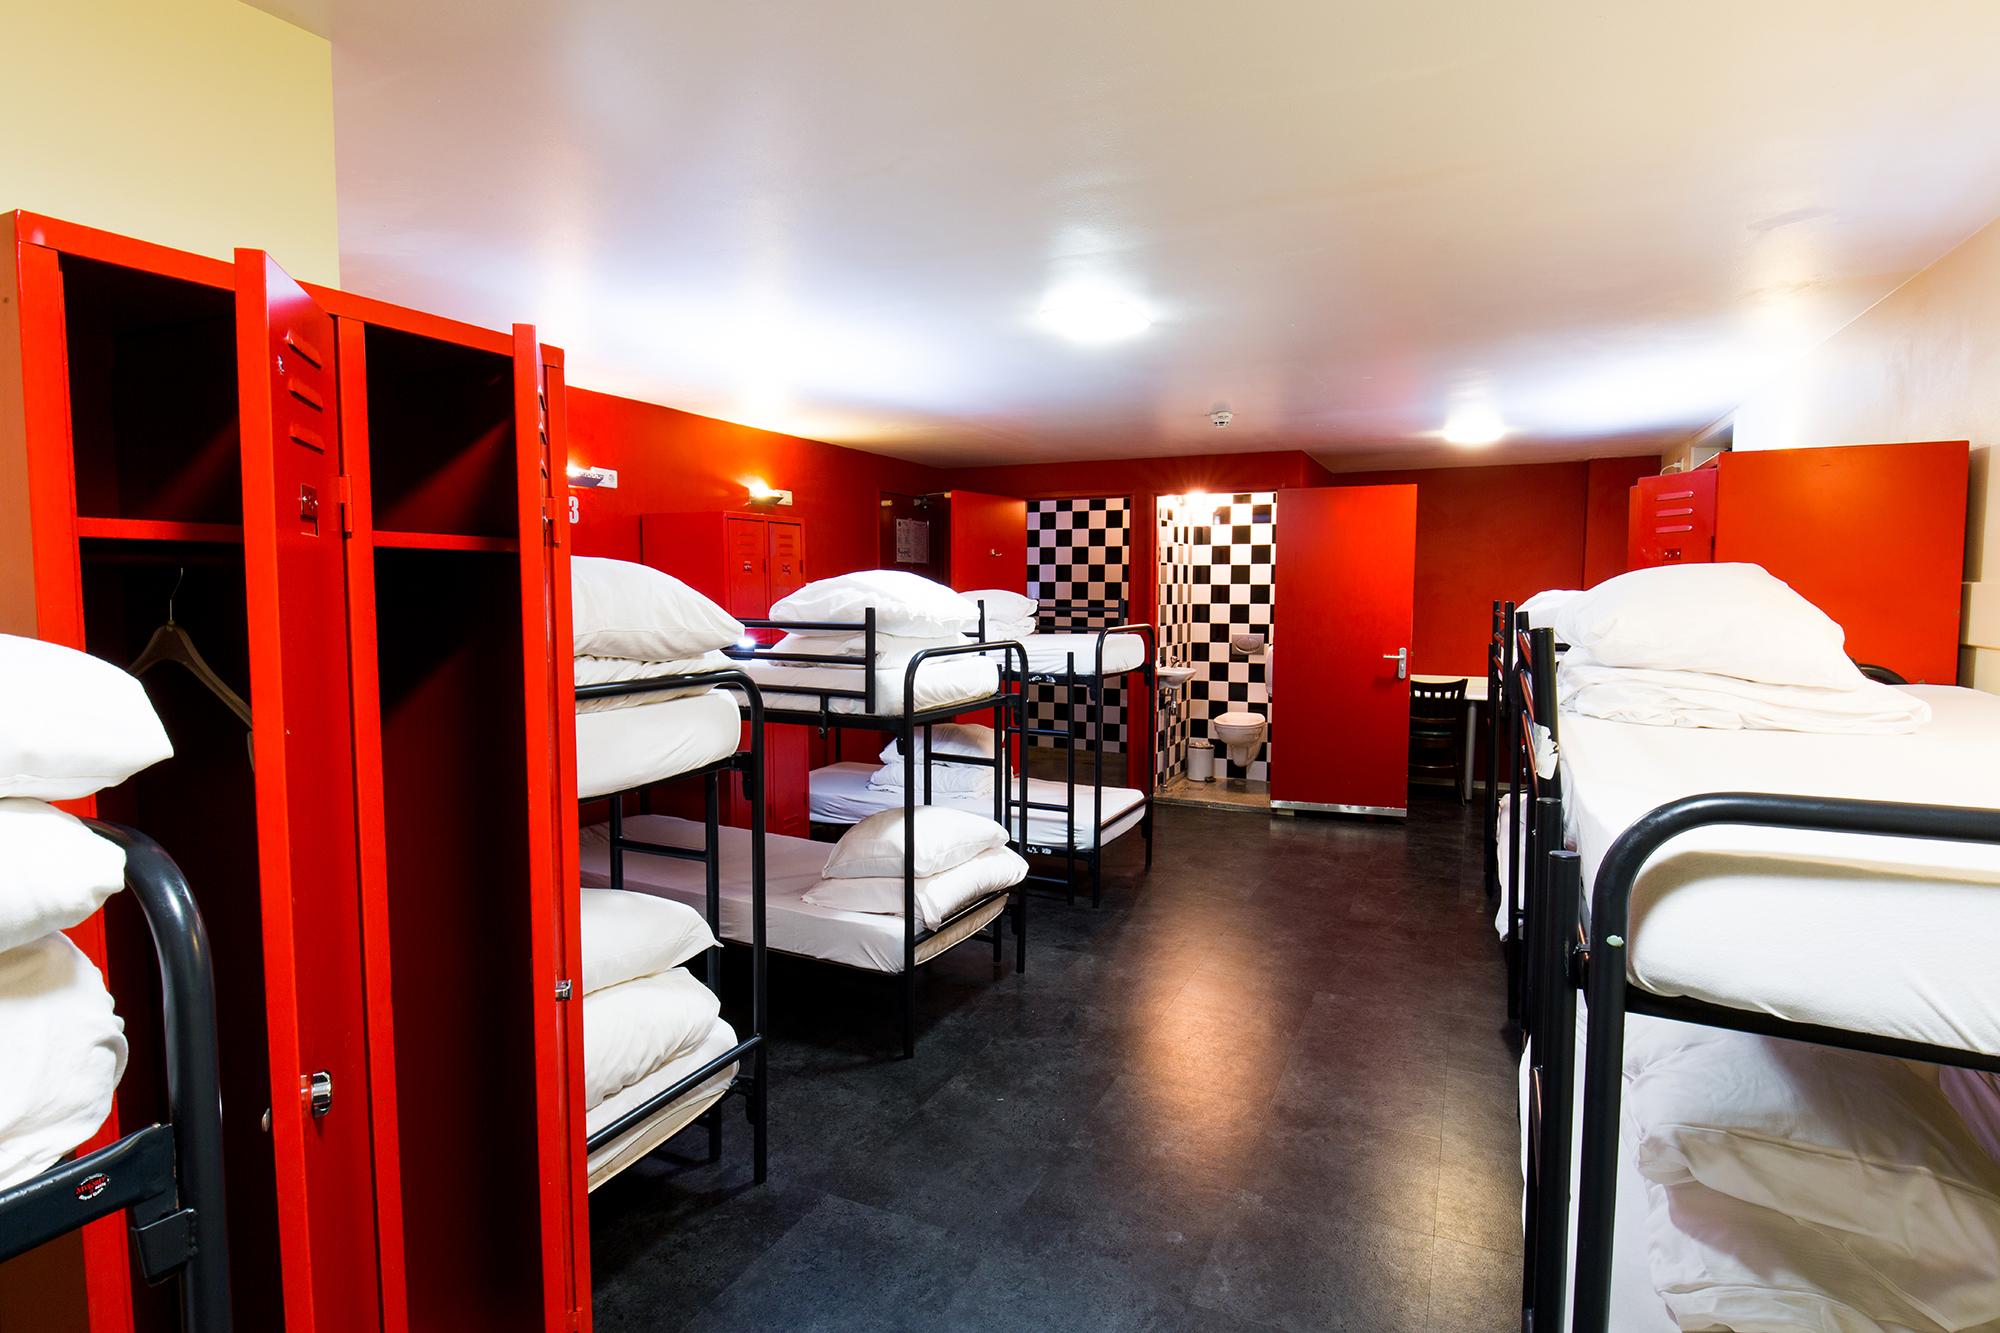 Home Sweet Dorm: Dorming 101